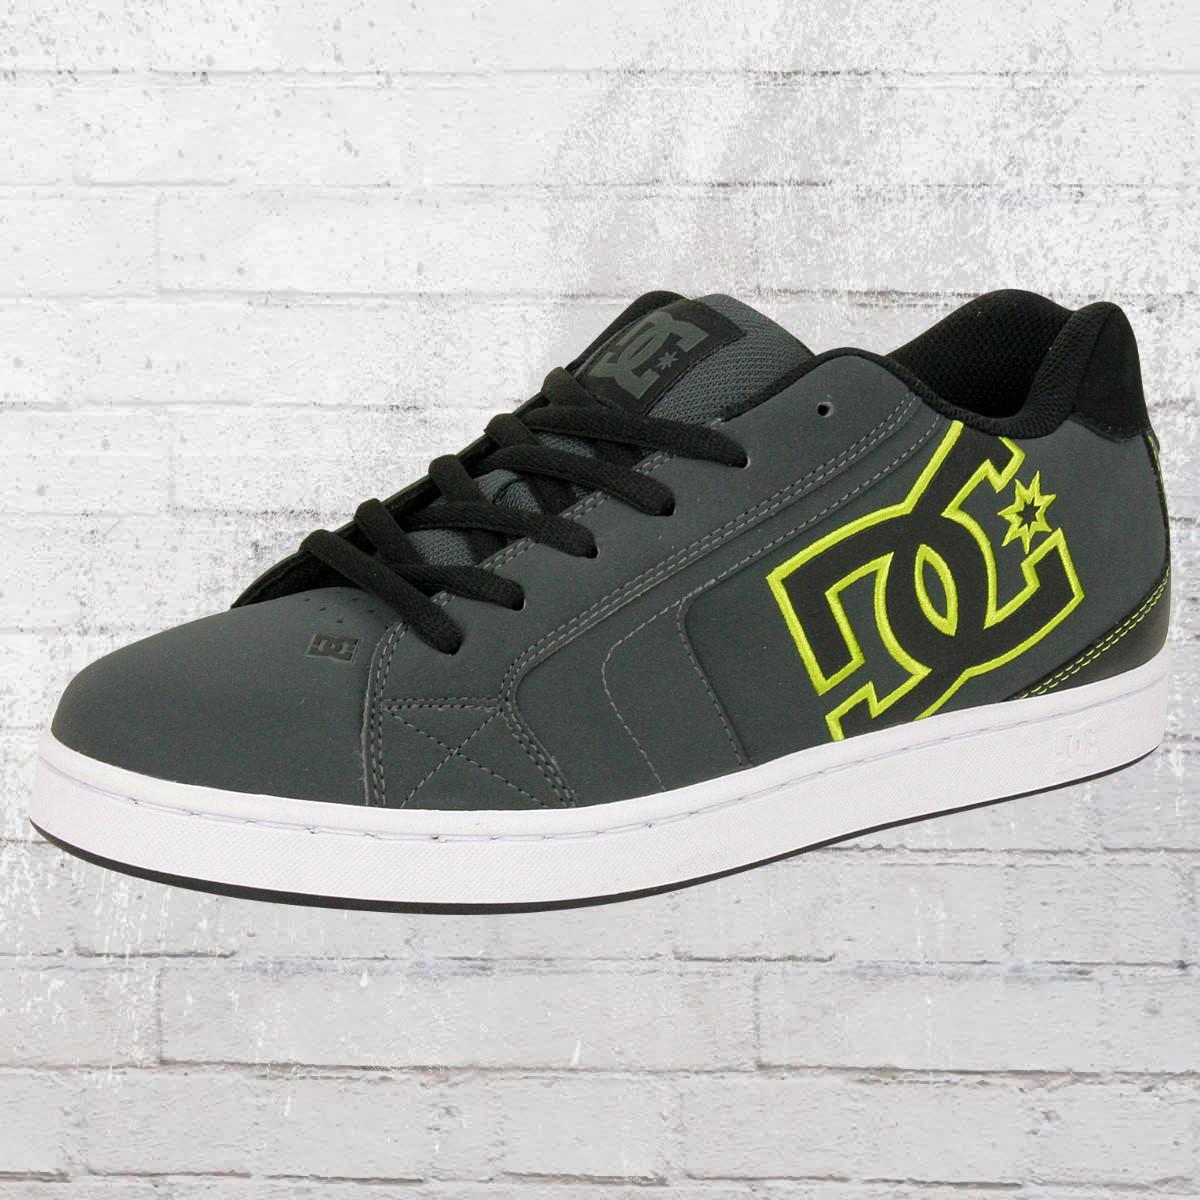 half off a4b7e 3c6ff Order now   DC Shoes Sneaker Male Net grey green